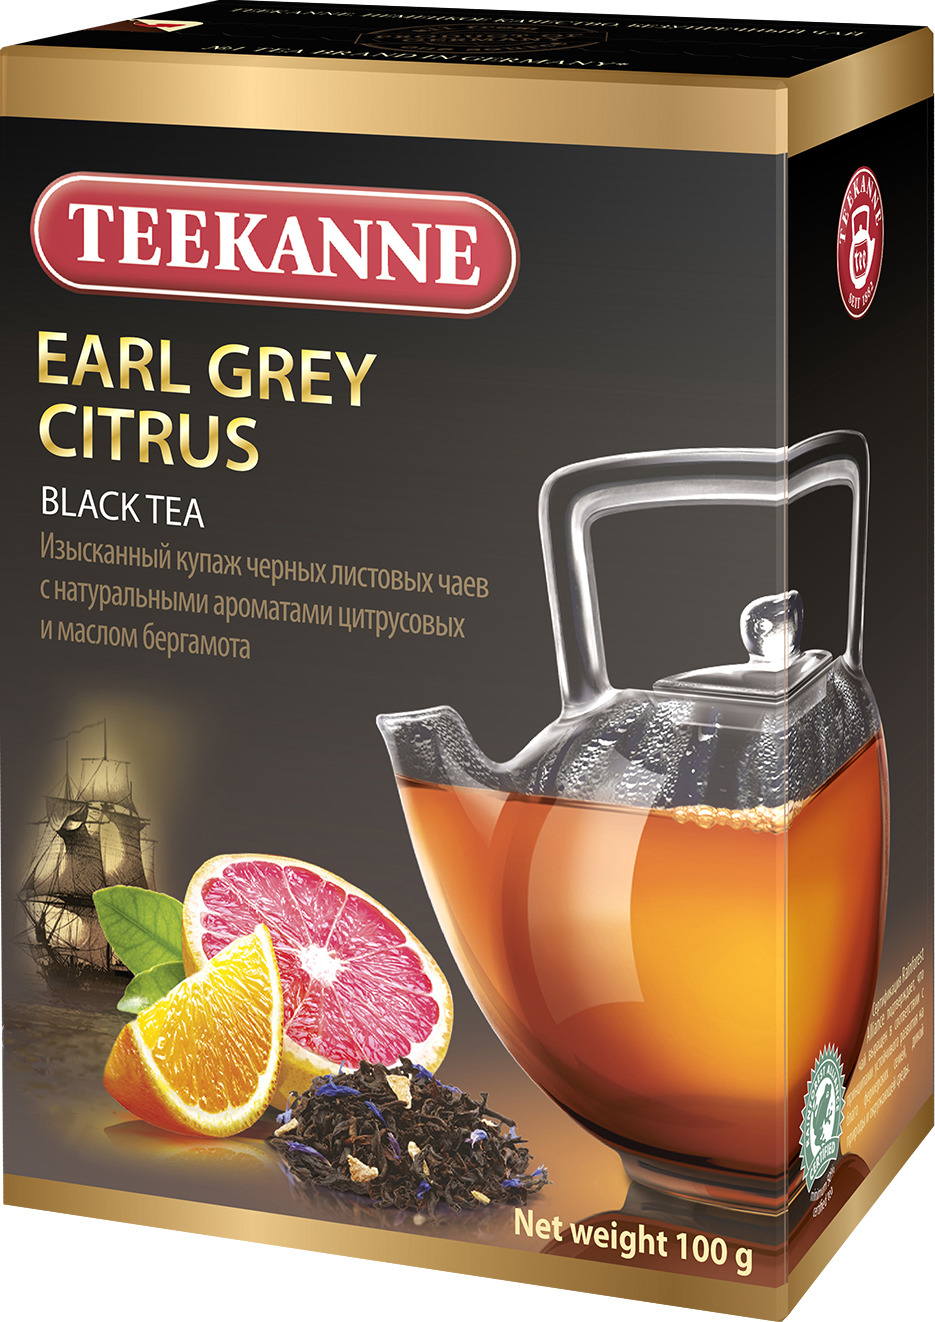 Чай листовой Teekanne Earl Grey Citrus черный ароматизированный, 100 г cкакалка nike weighted rope 2 0 ns grey black bright citrus